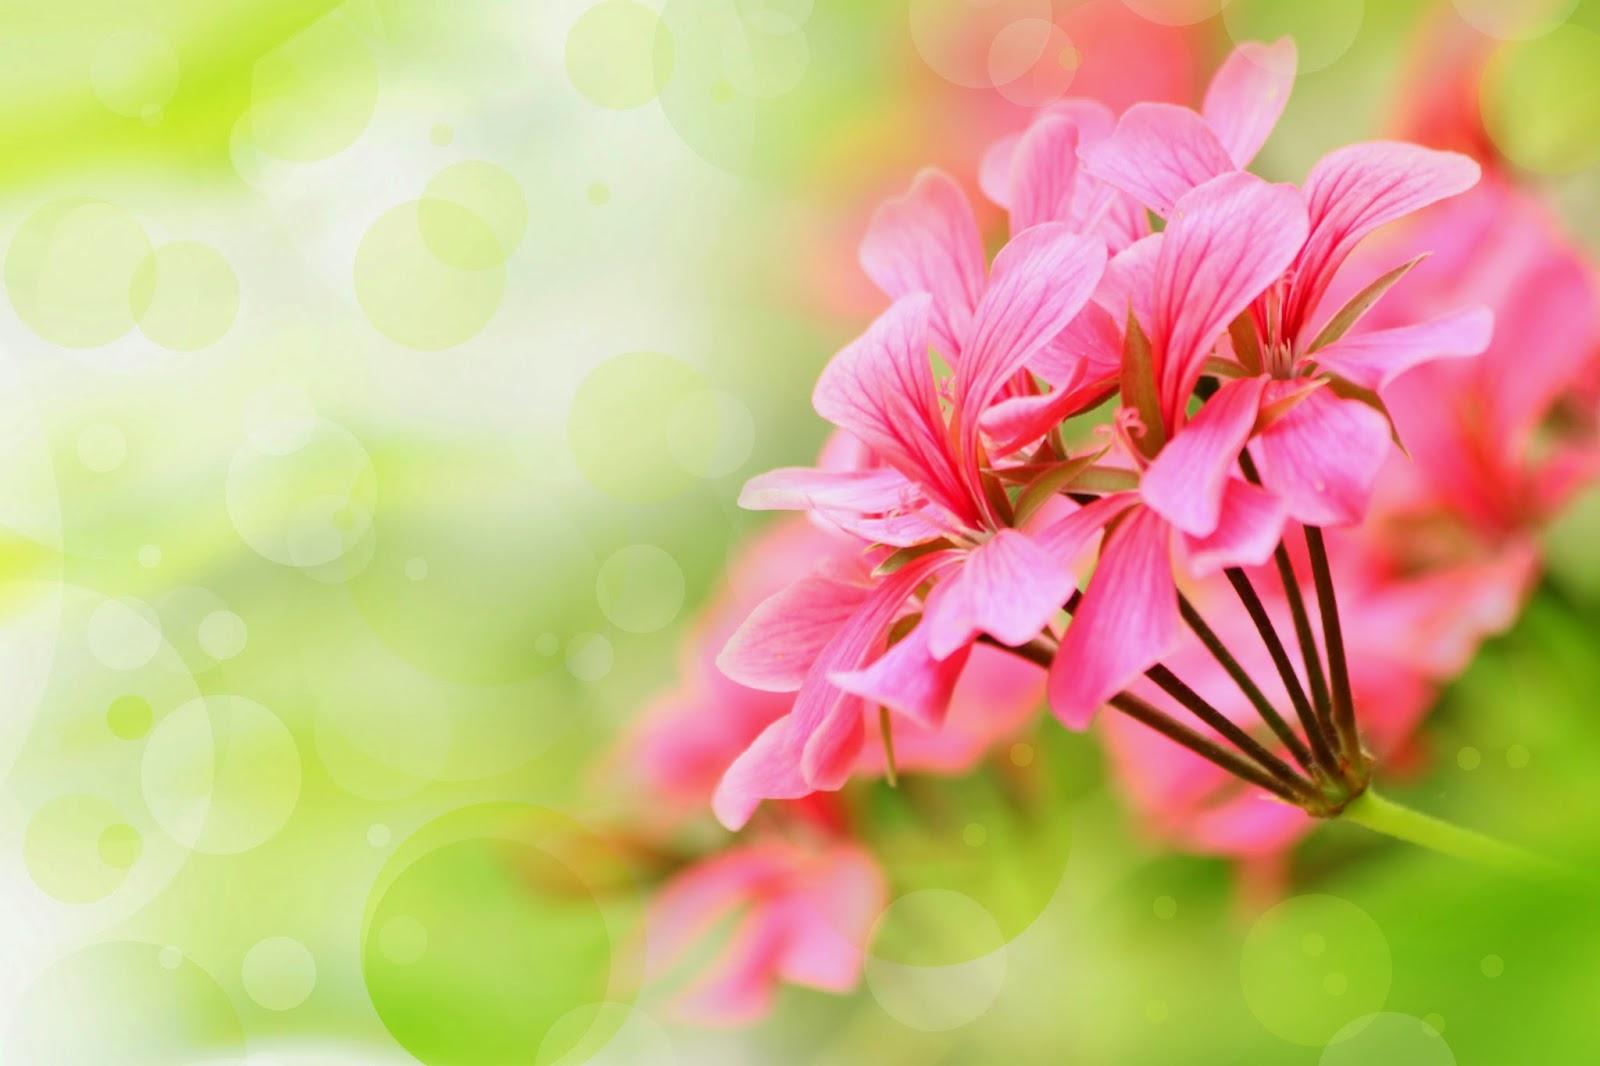 Imagenes Fotograficas: Imagenes Bonitas De Flores Para